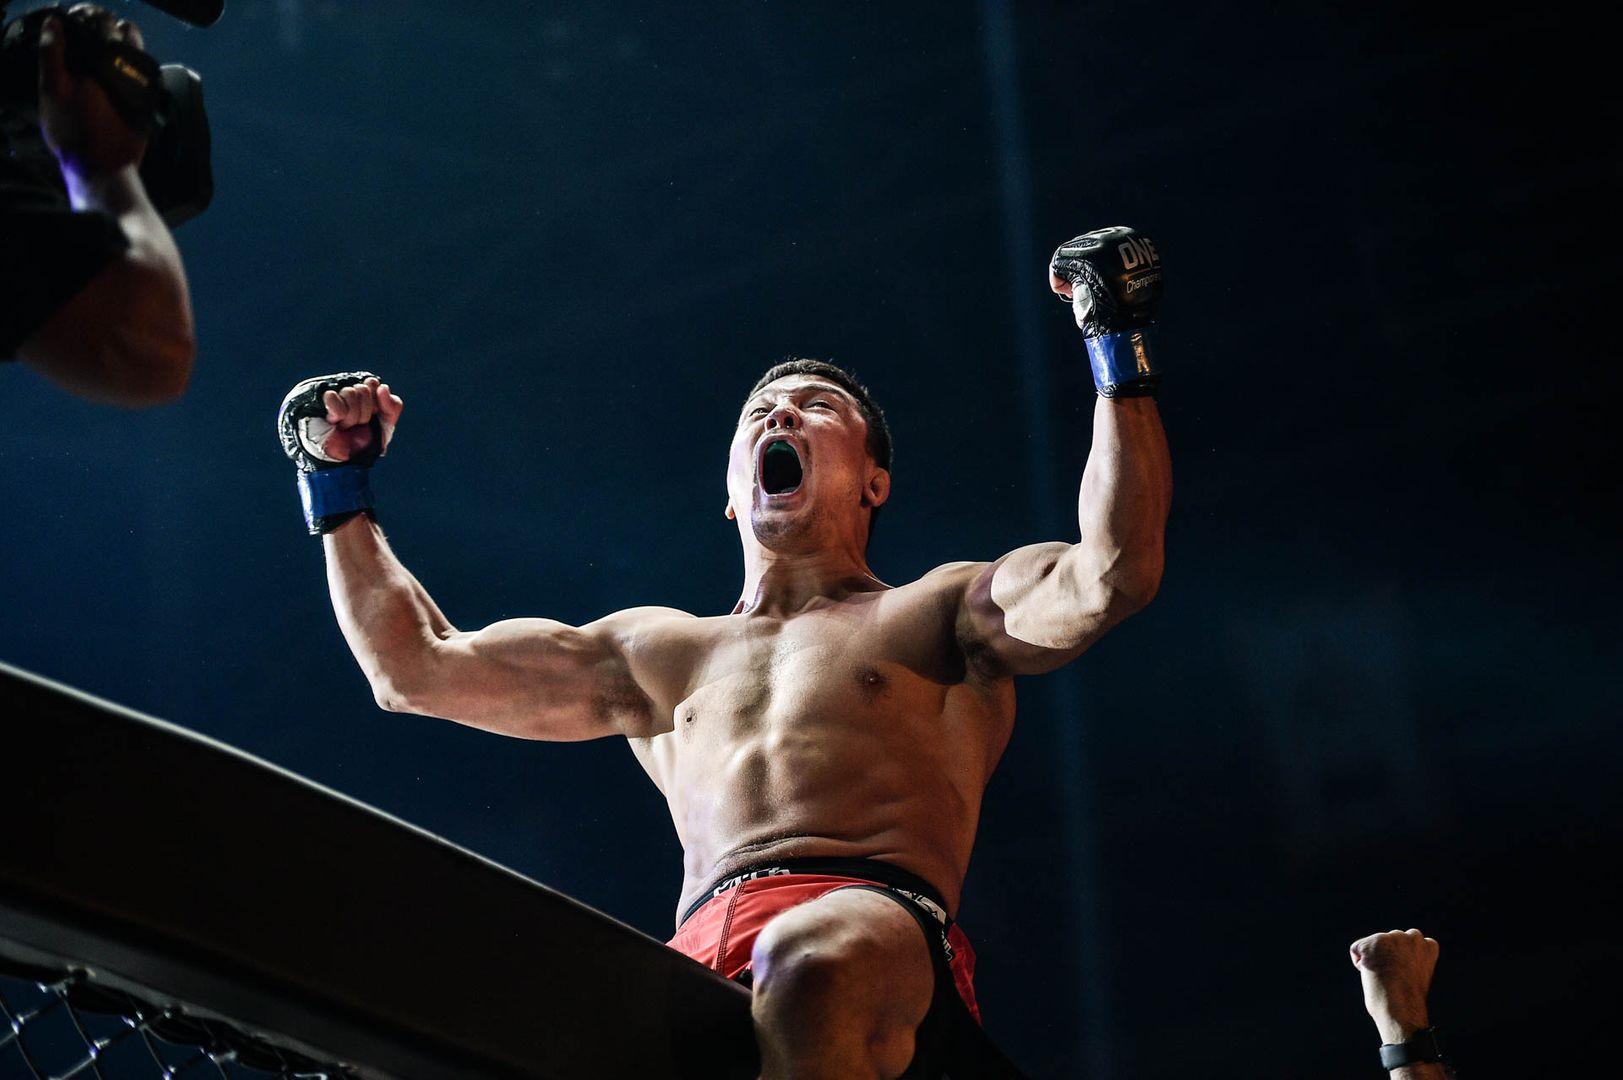 Timofey Nastyuhin celebrateshis big victory over Eddie Alvarez